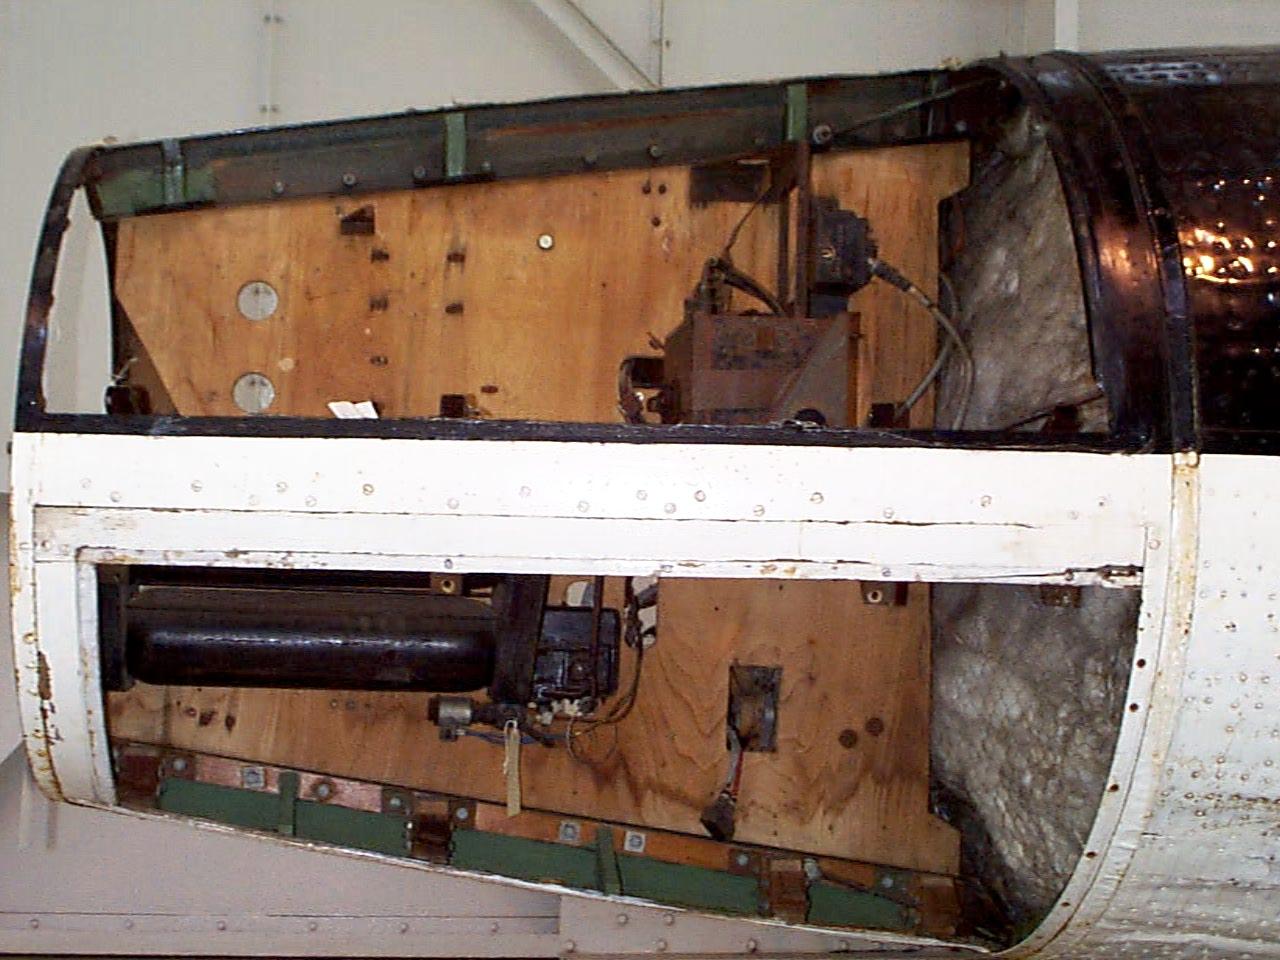 Equipment bays 1 and 4